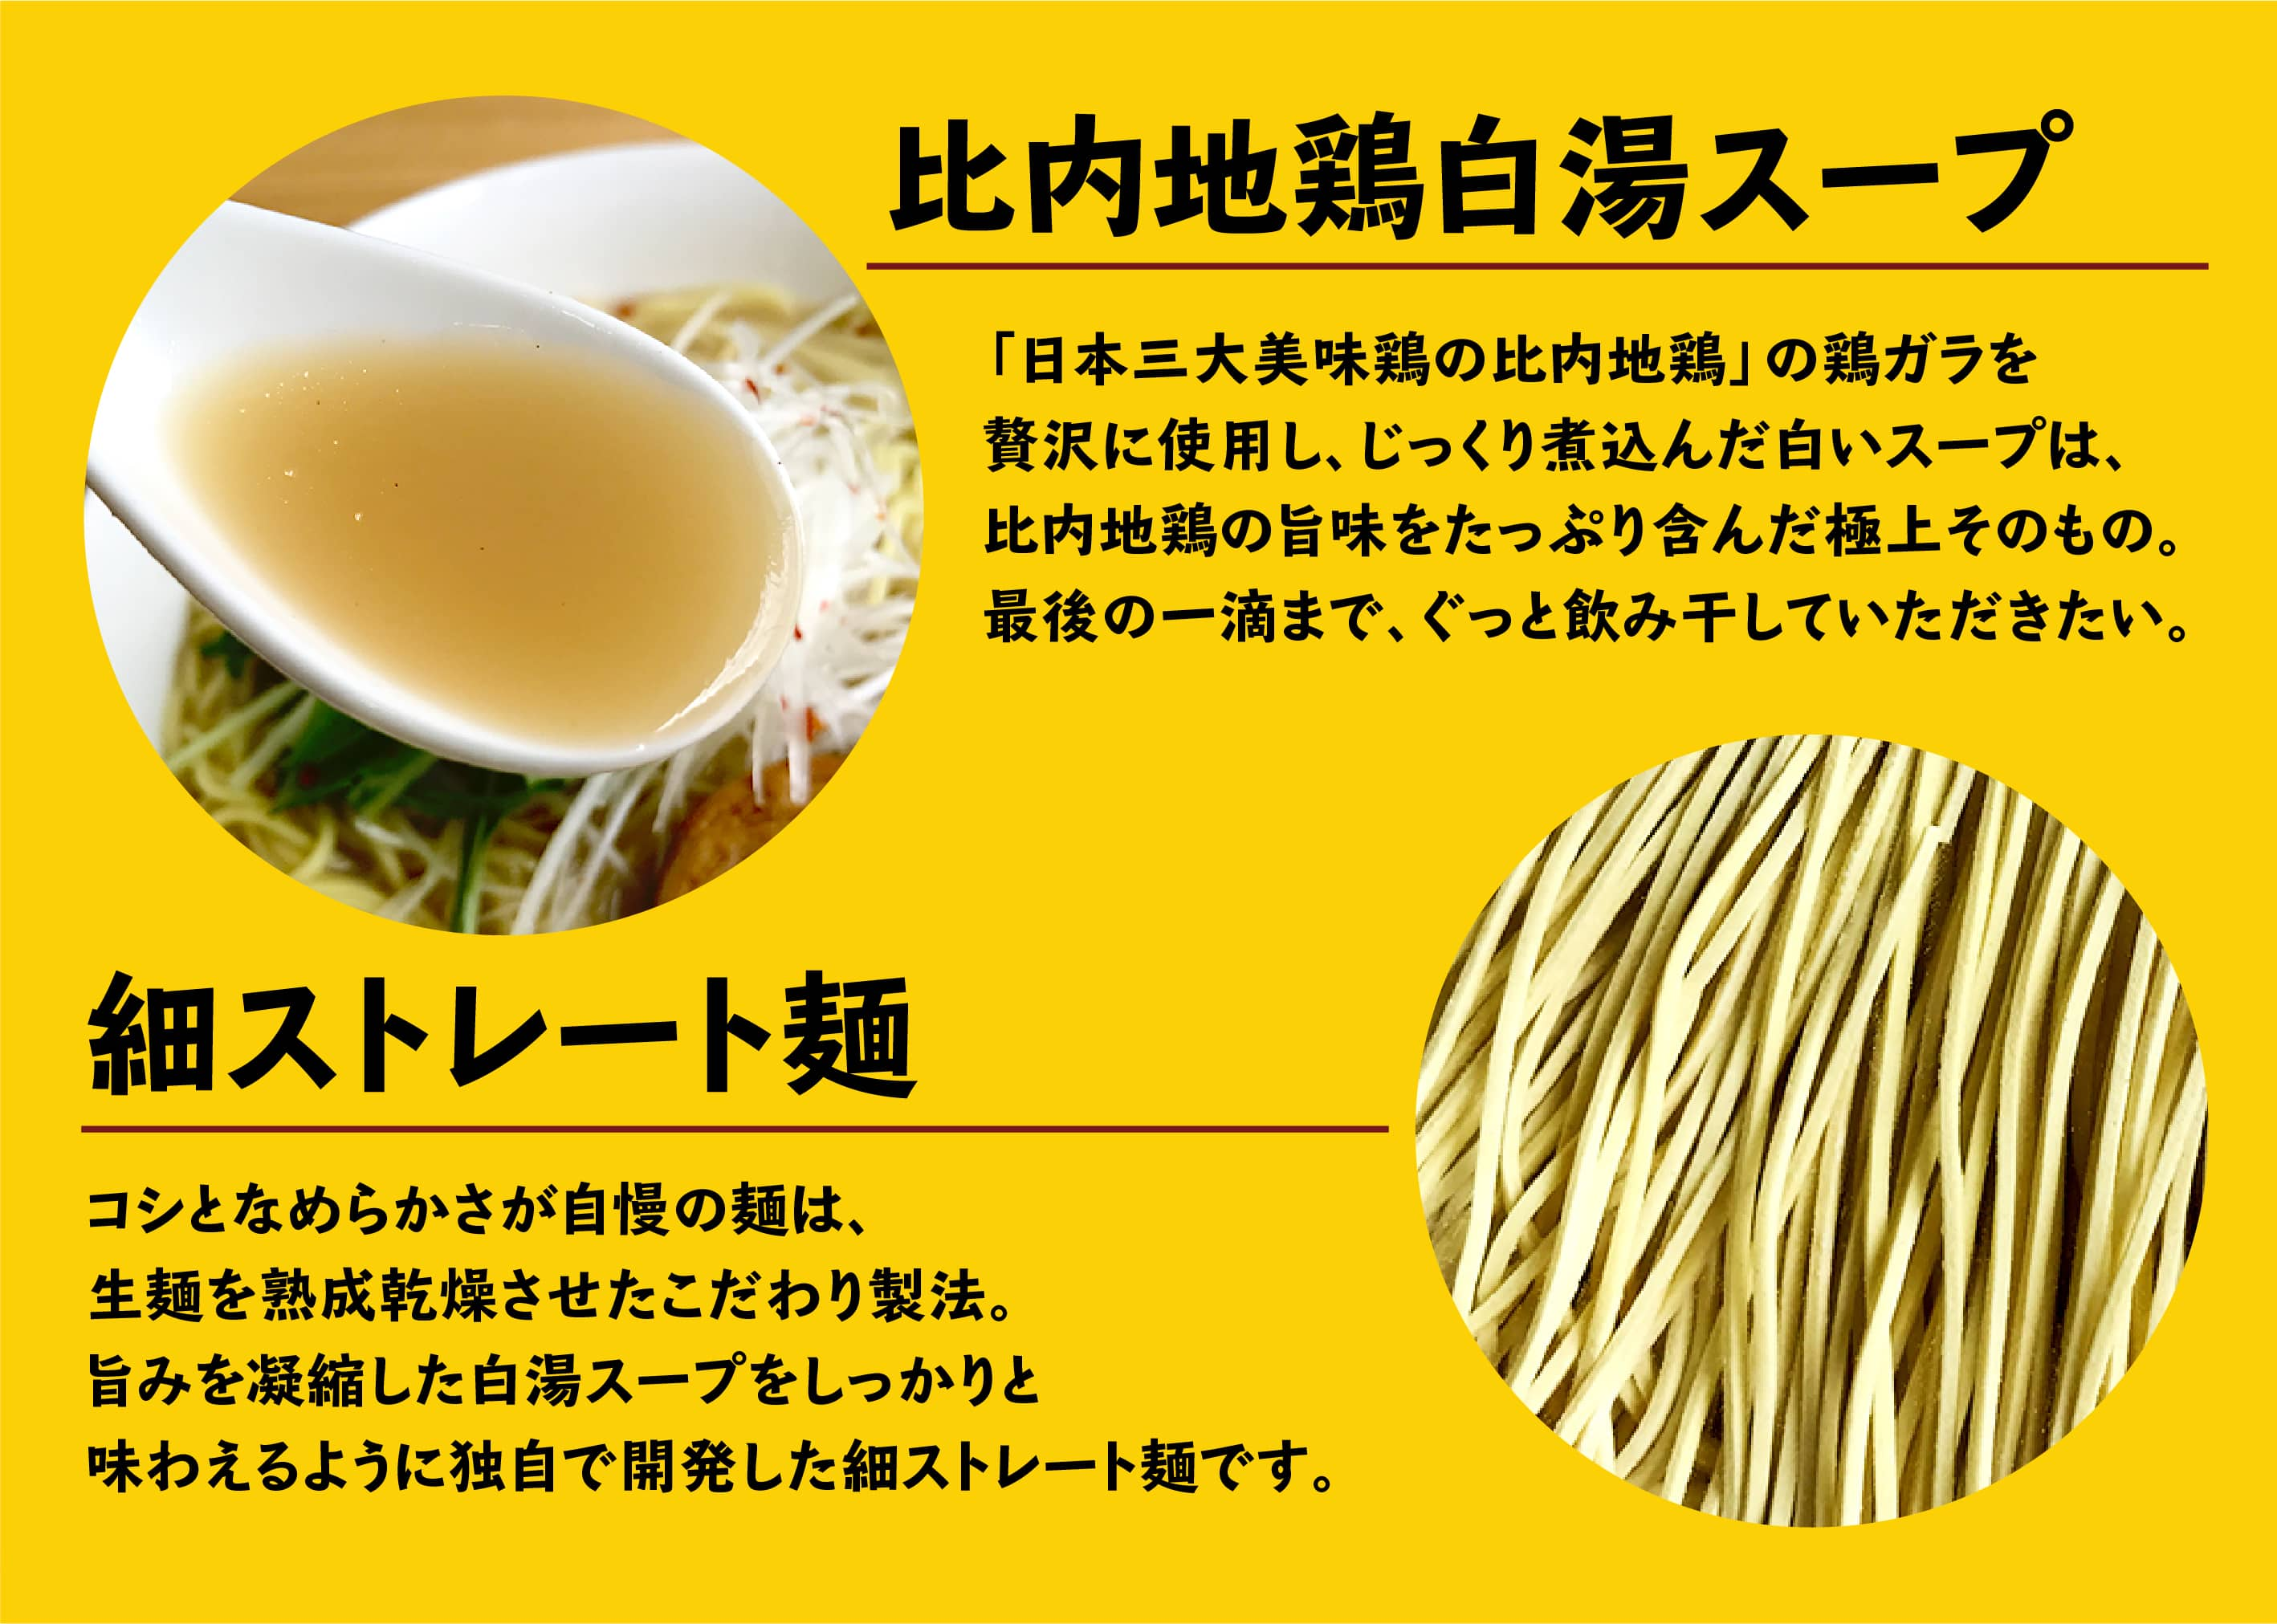 UMAMY[ウマミー] 比内地鶏白湯ラーメン 味噌味